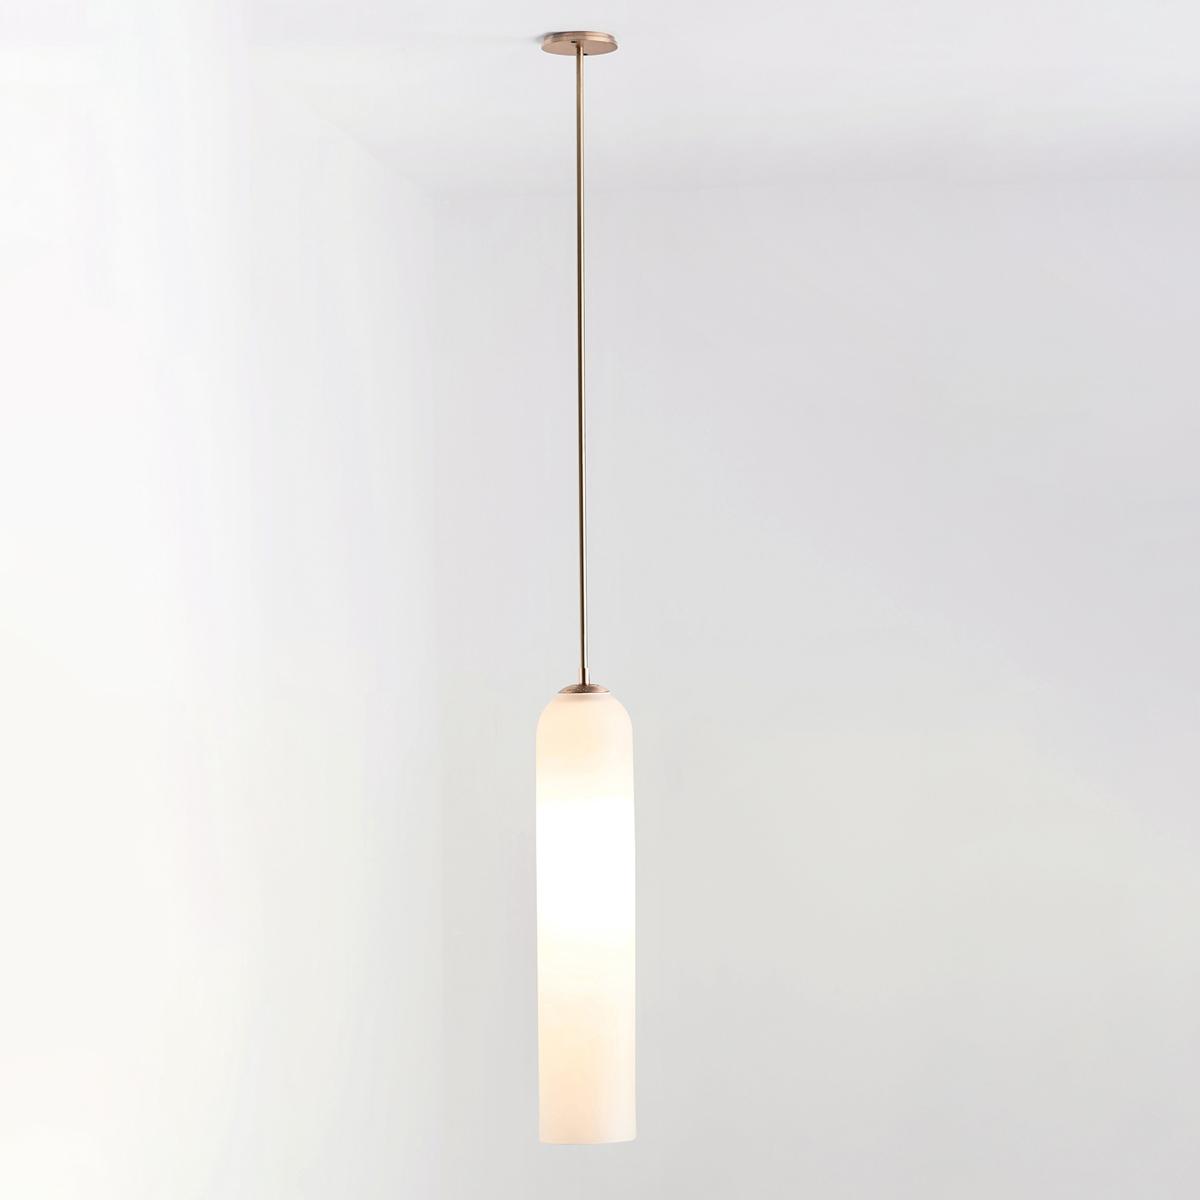 Hero articolo lighting float pendant snow brass short on